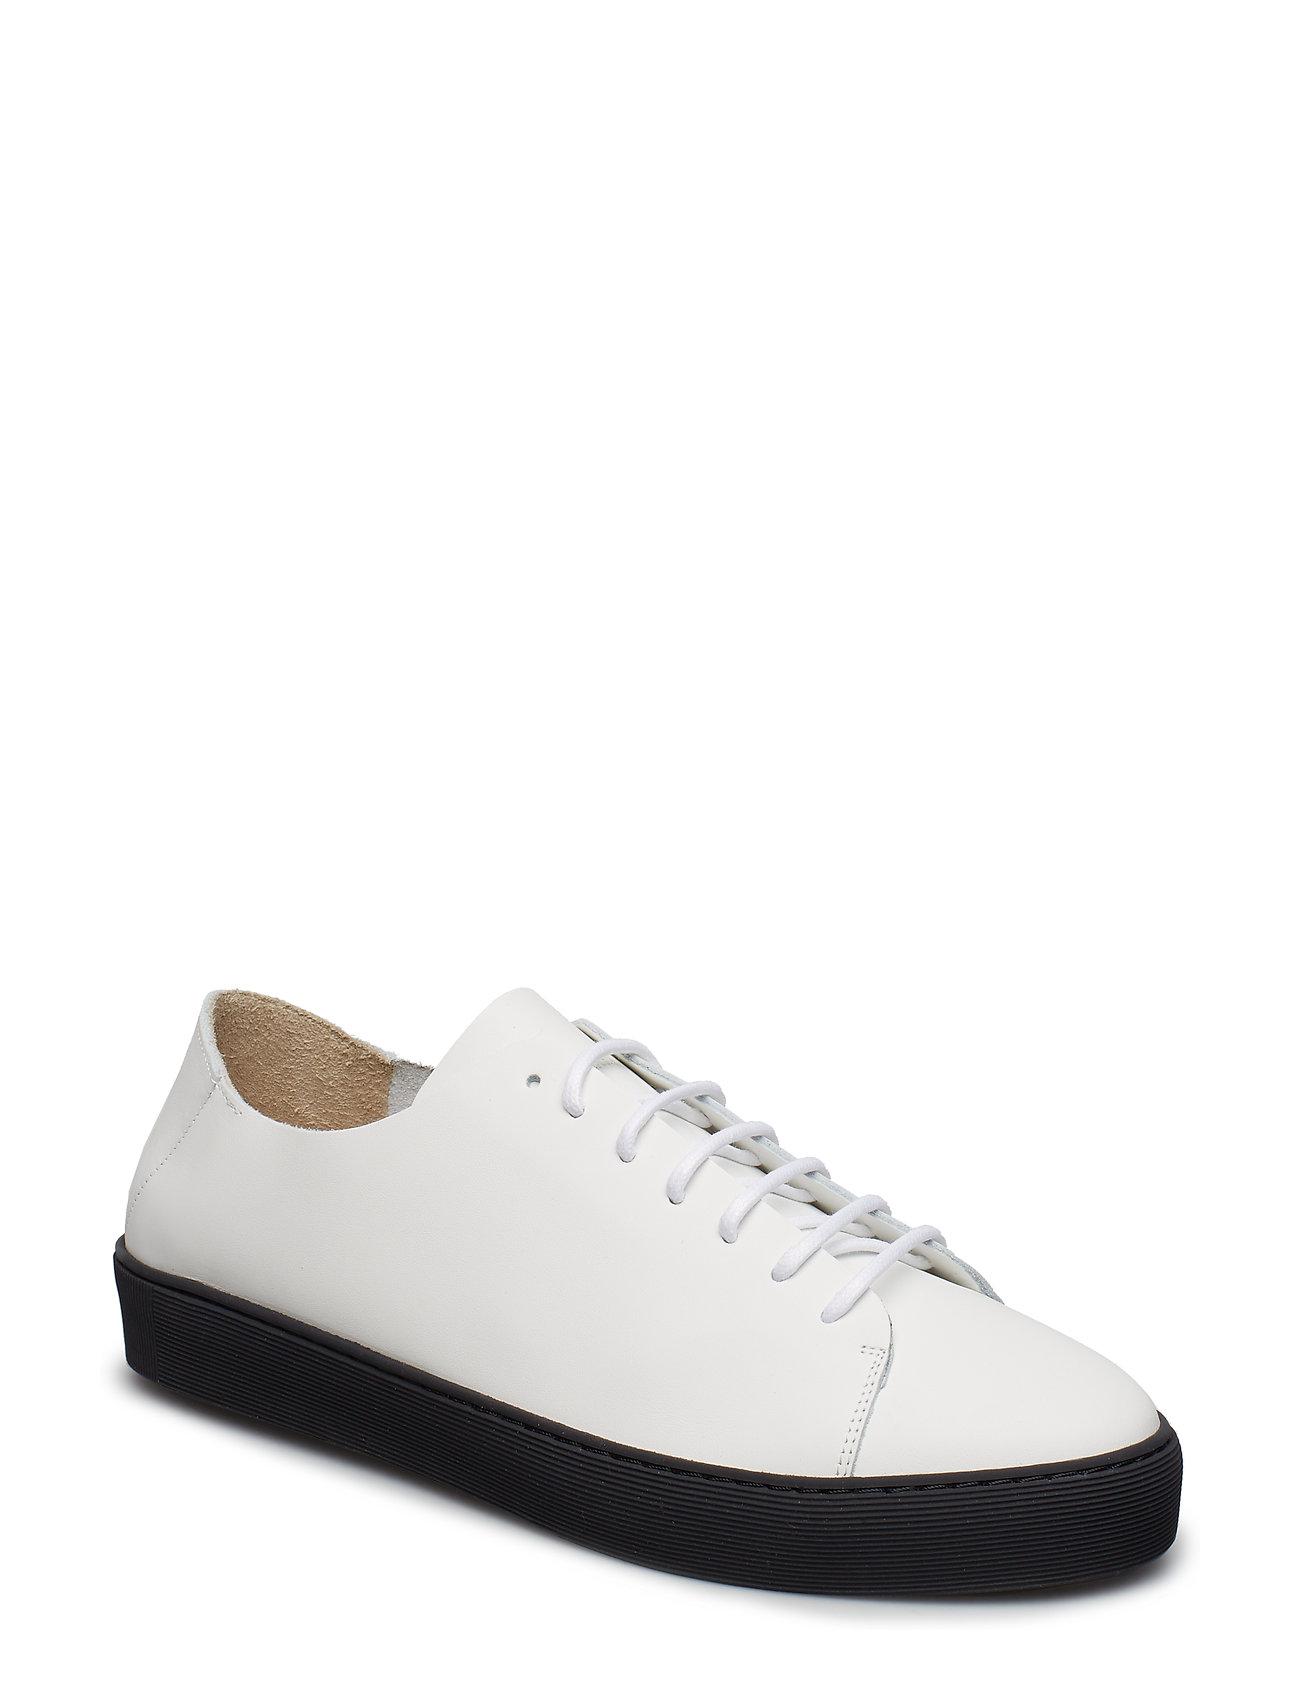 Image of Doric Impact Derby Shoe Low-top Sneakers Hvid Royal RepubliQ (3142010773)